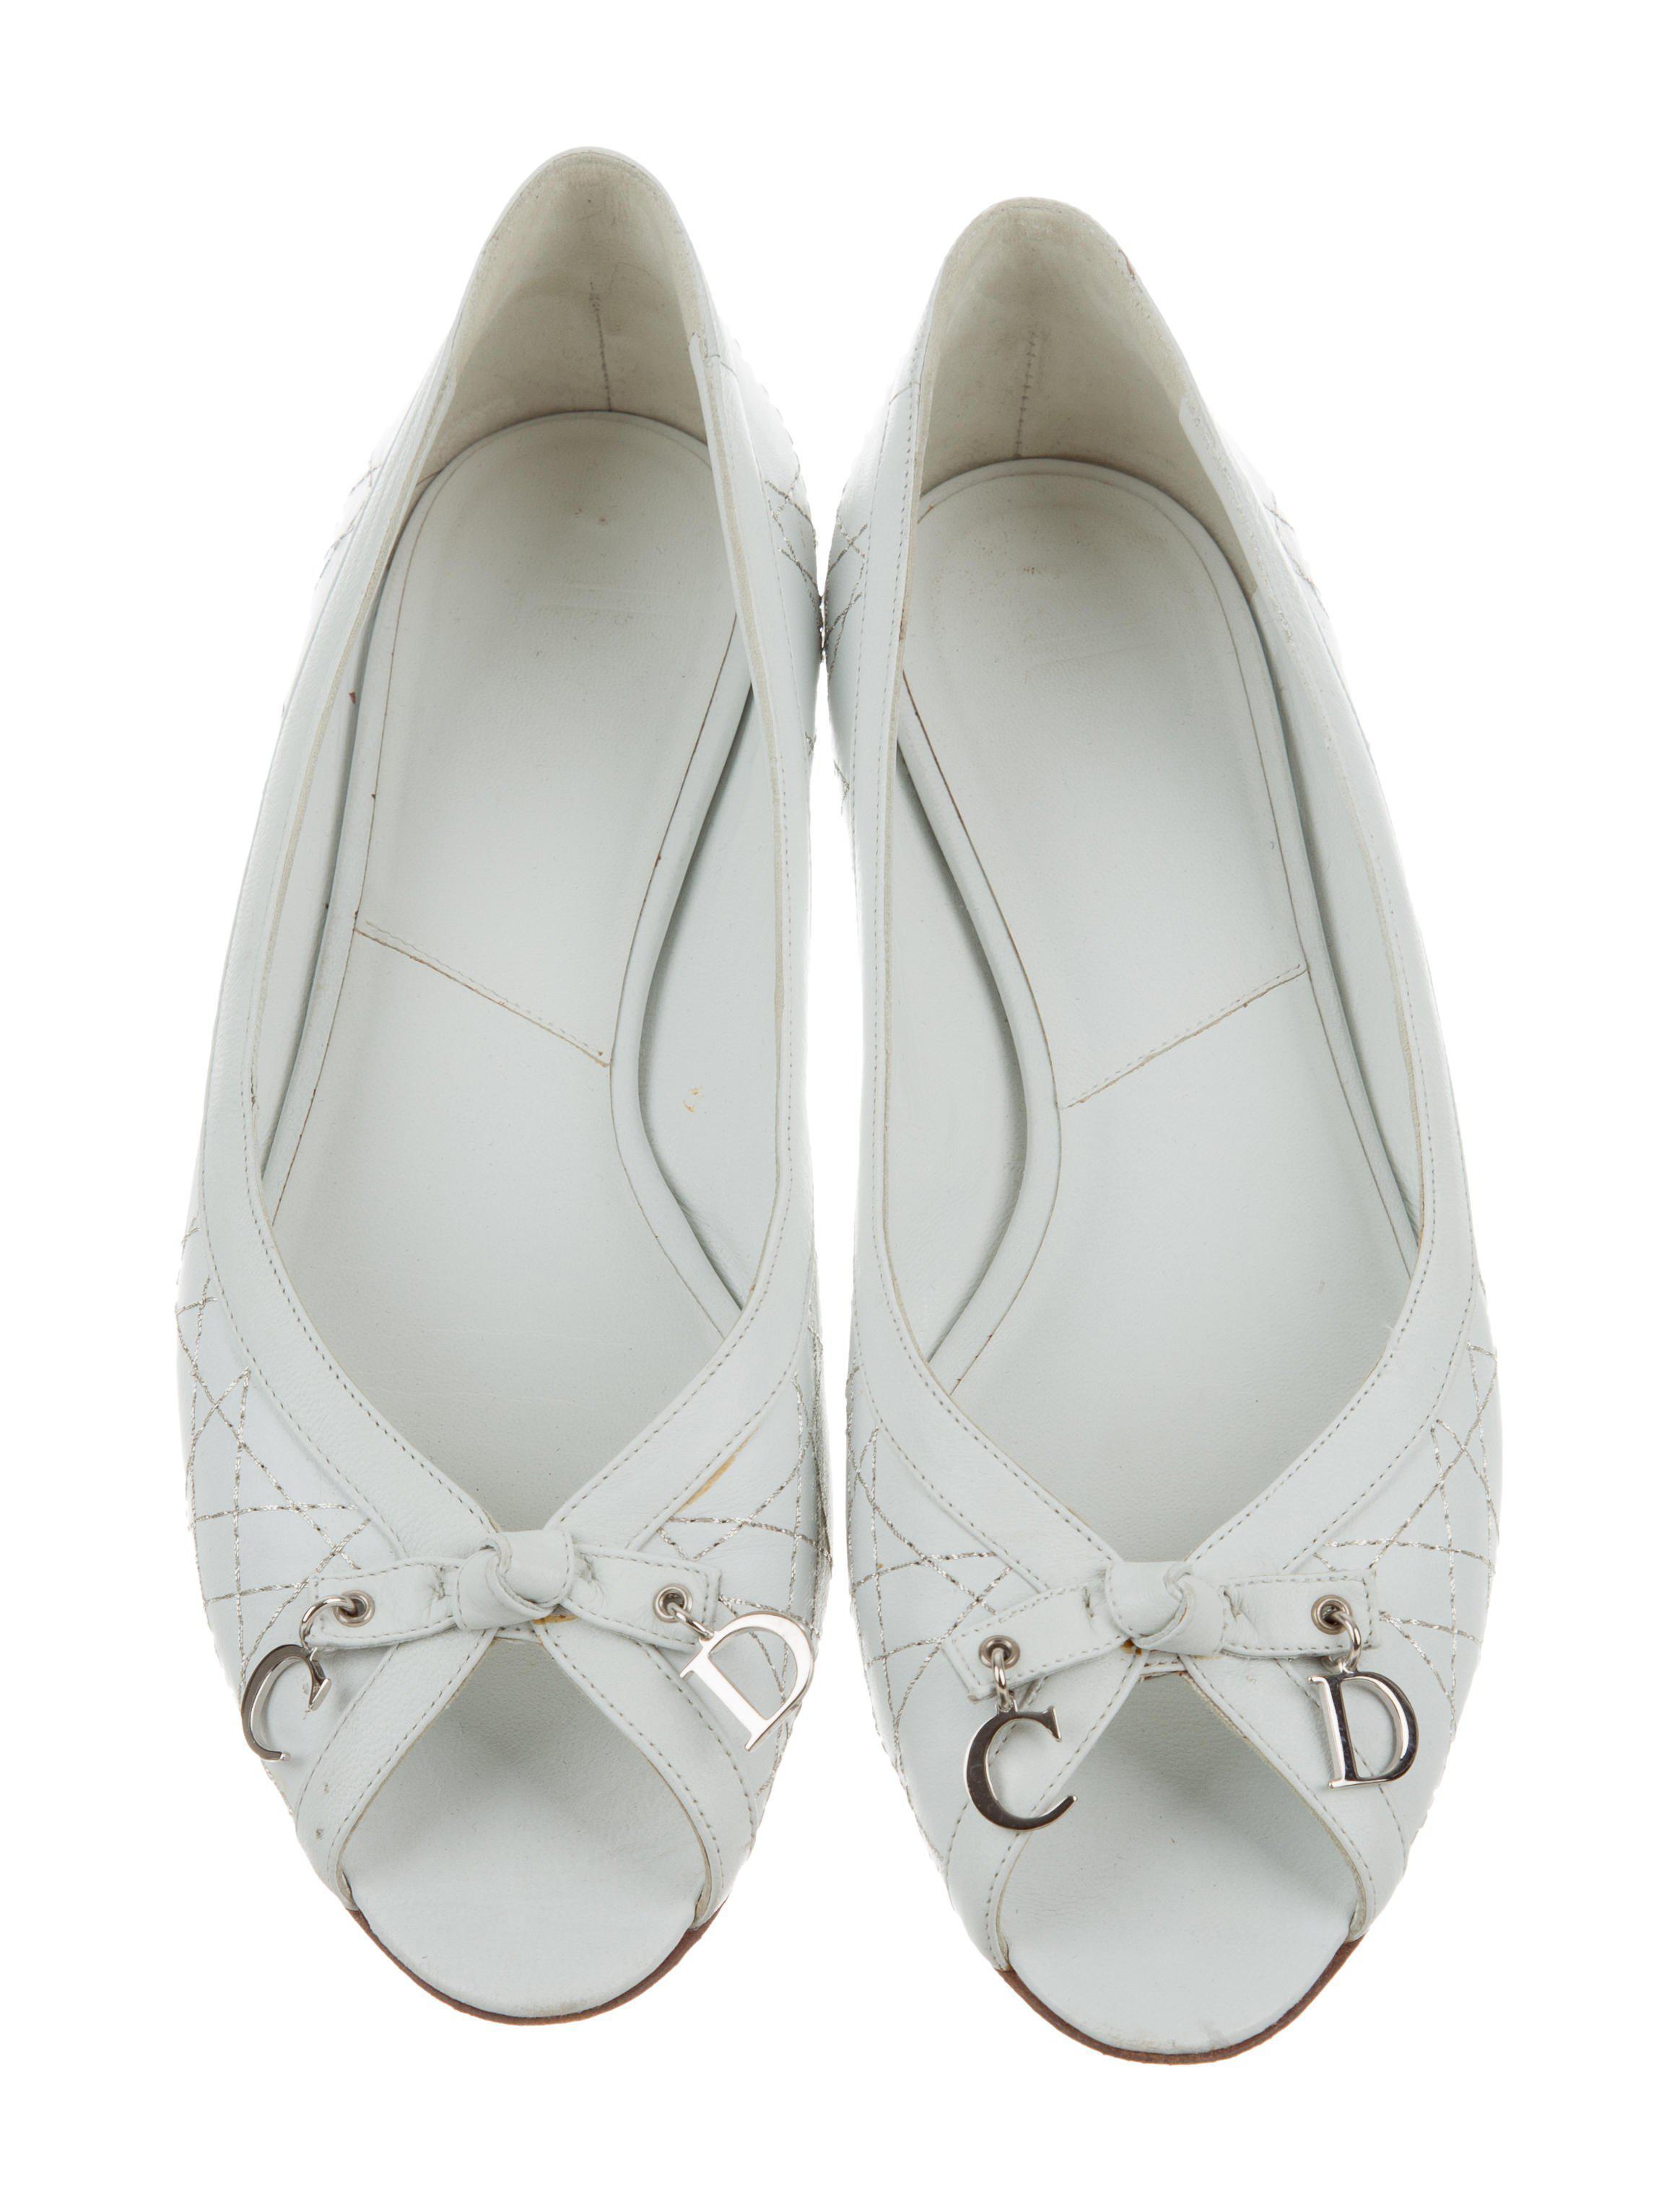 93c77535f7013c Lyst - Dior Cannage Peep-toe Flats White in Metallic